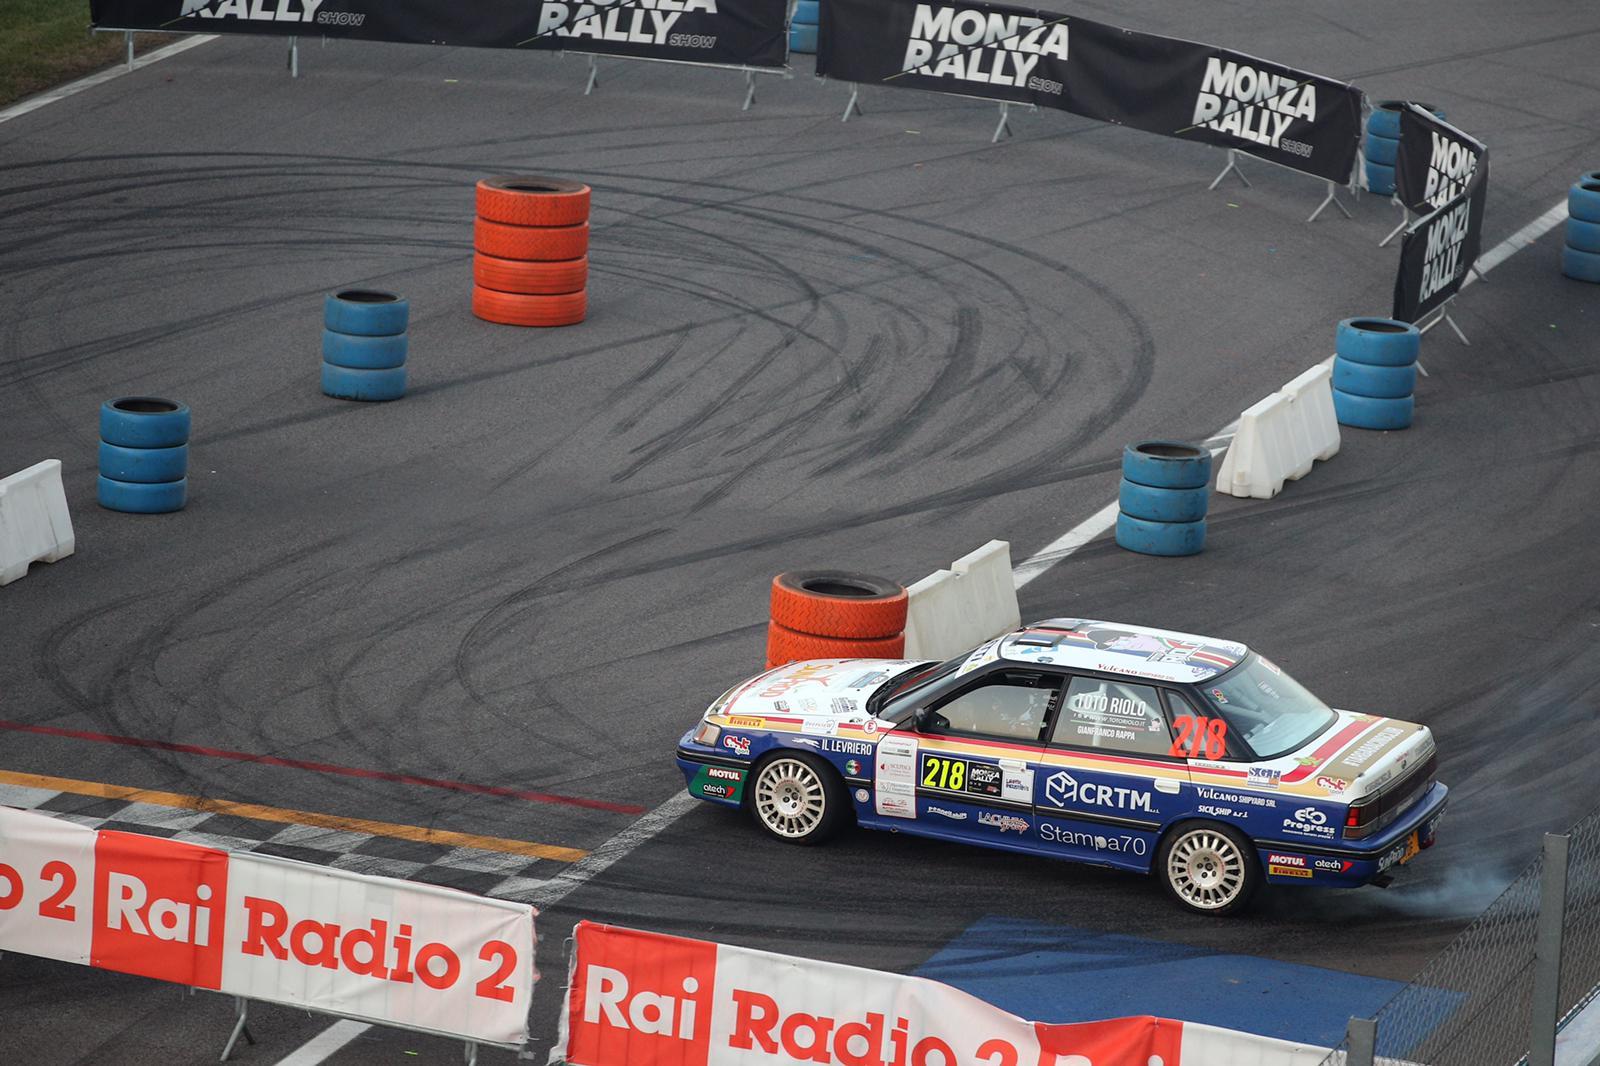 Riolo Rappa Subaru Master Show